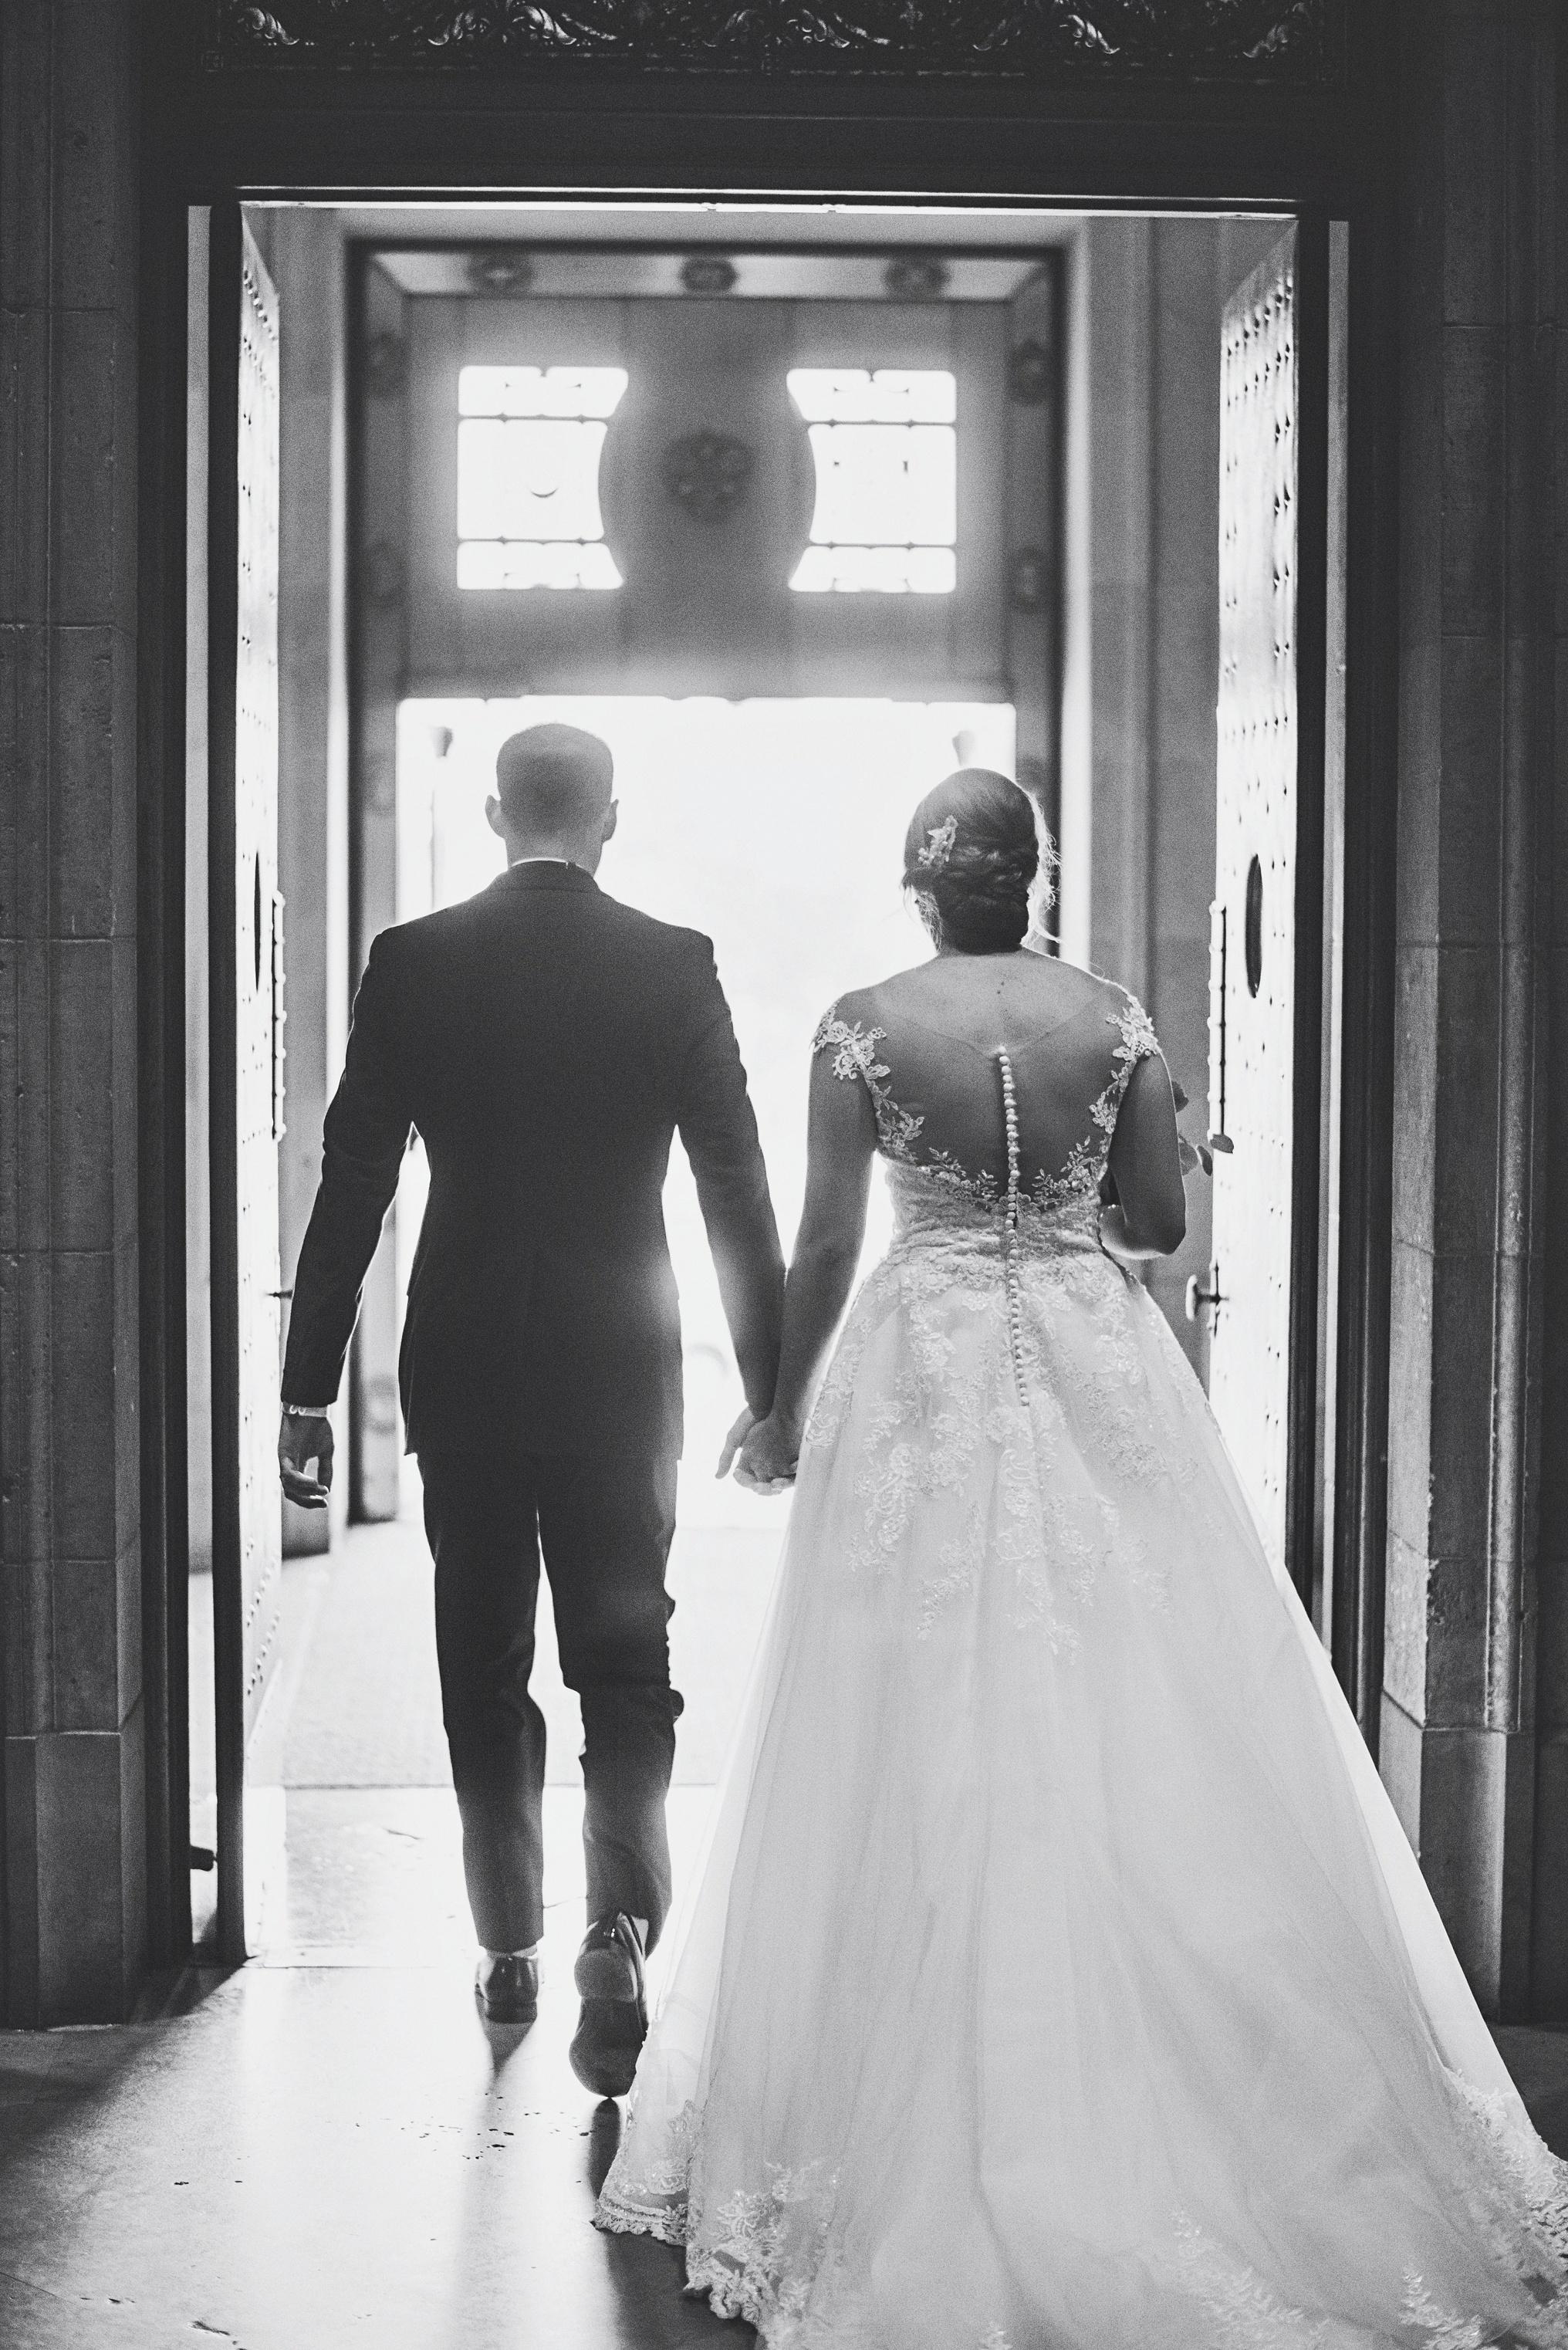 best_wedding_photography_2017_by_lucas_botz_photography_156.jpg